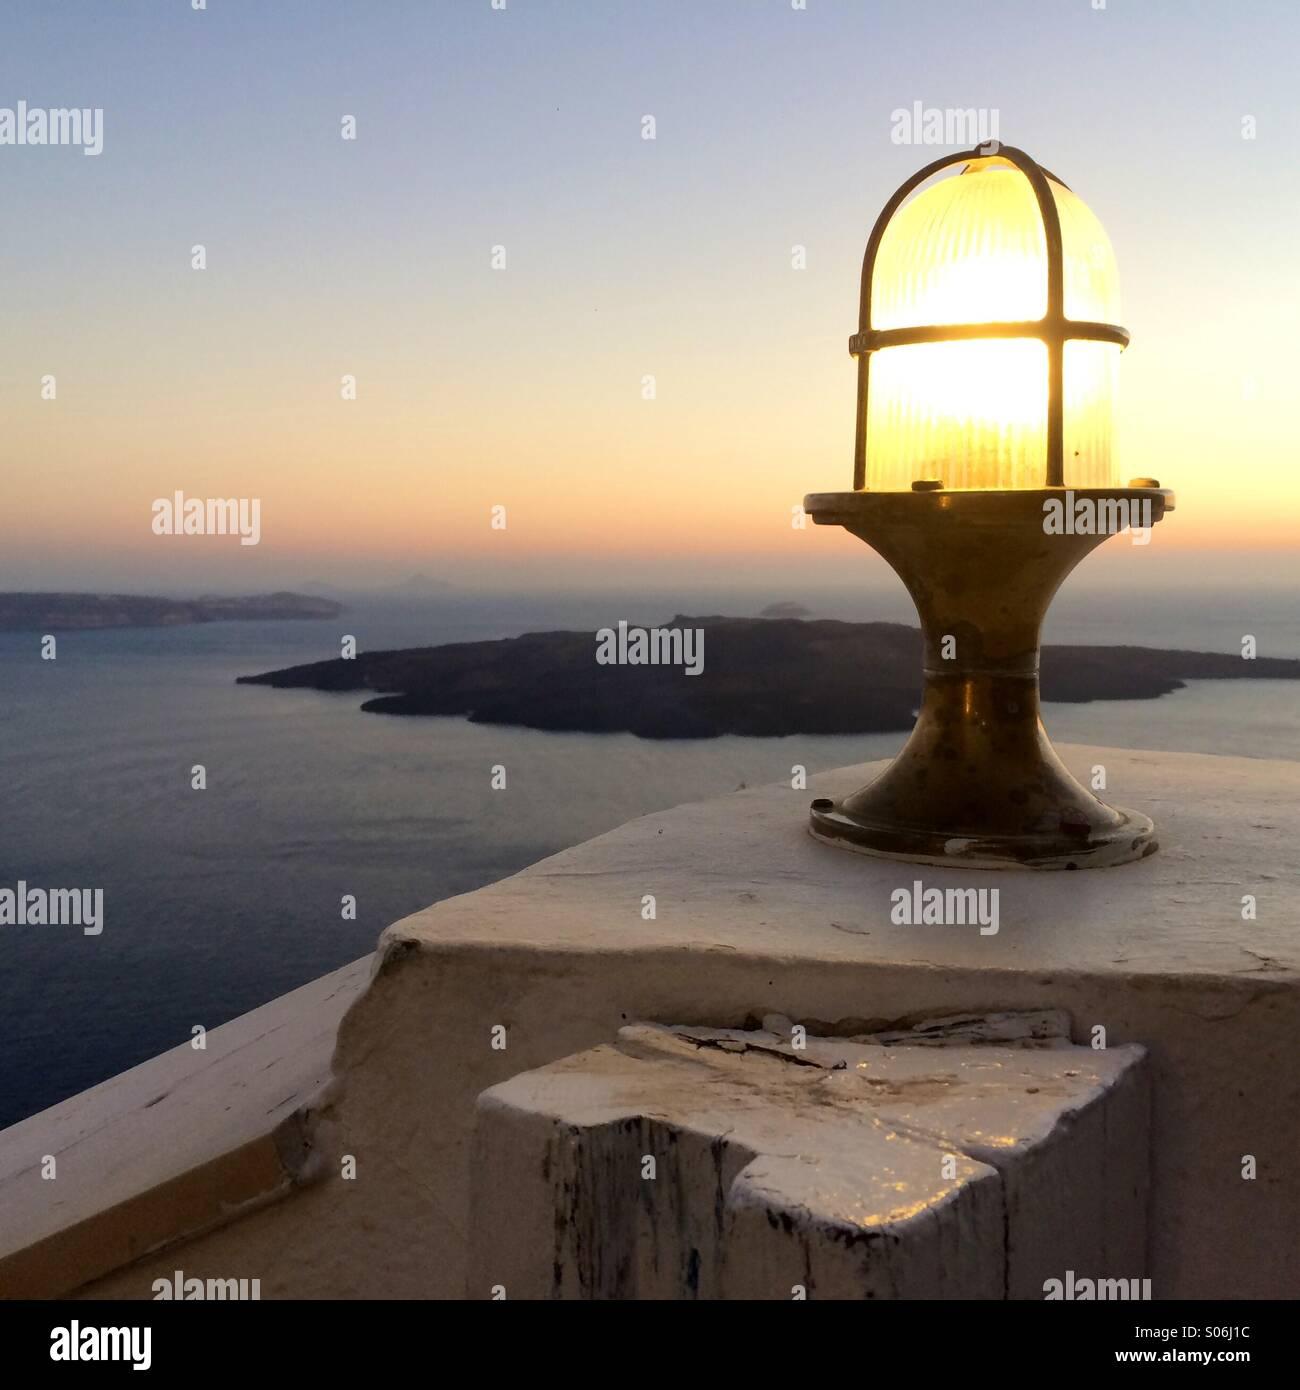 Light up the island - Stock Image